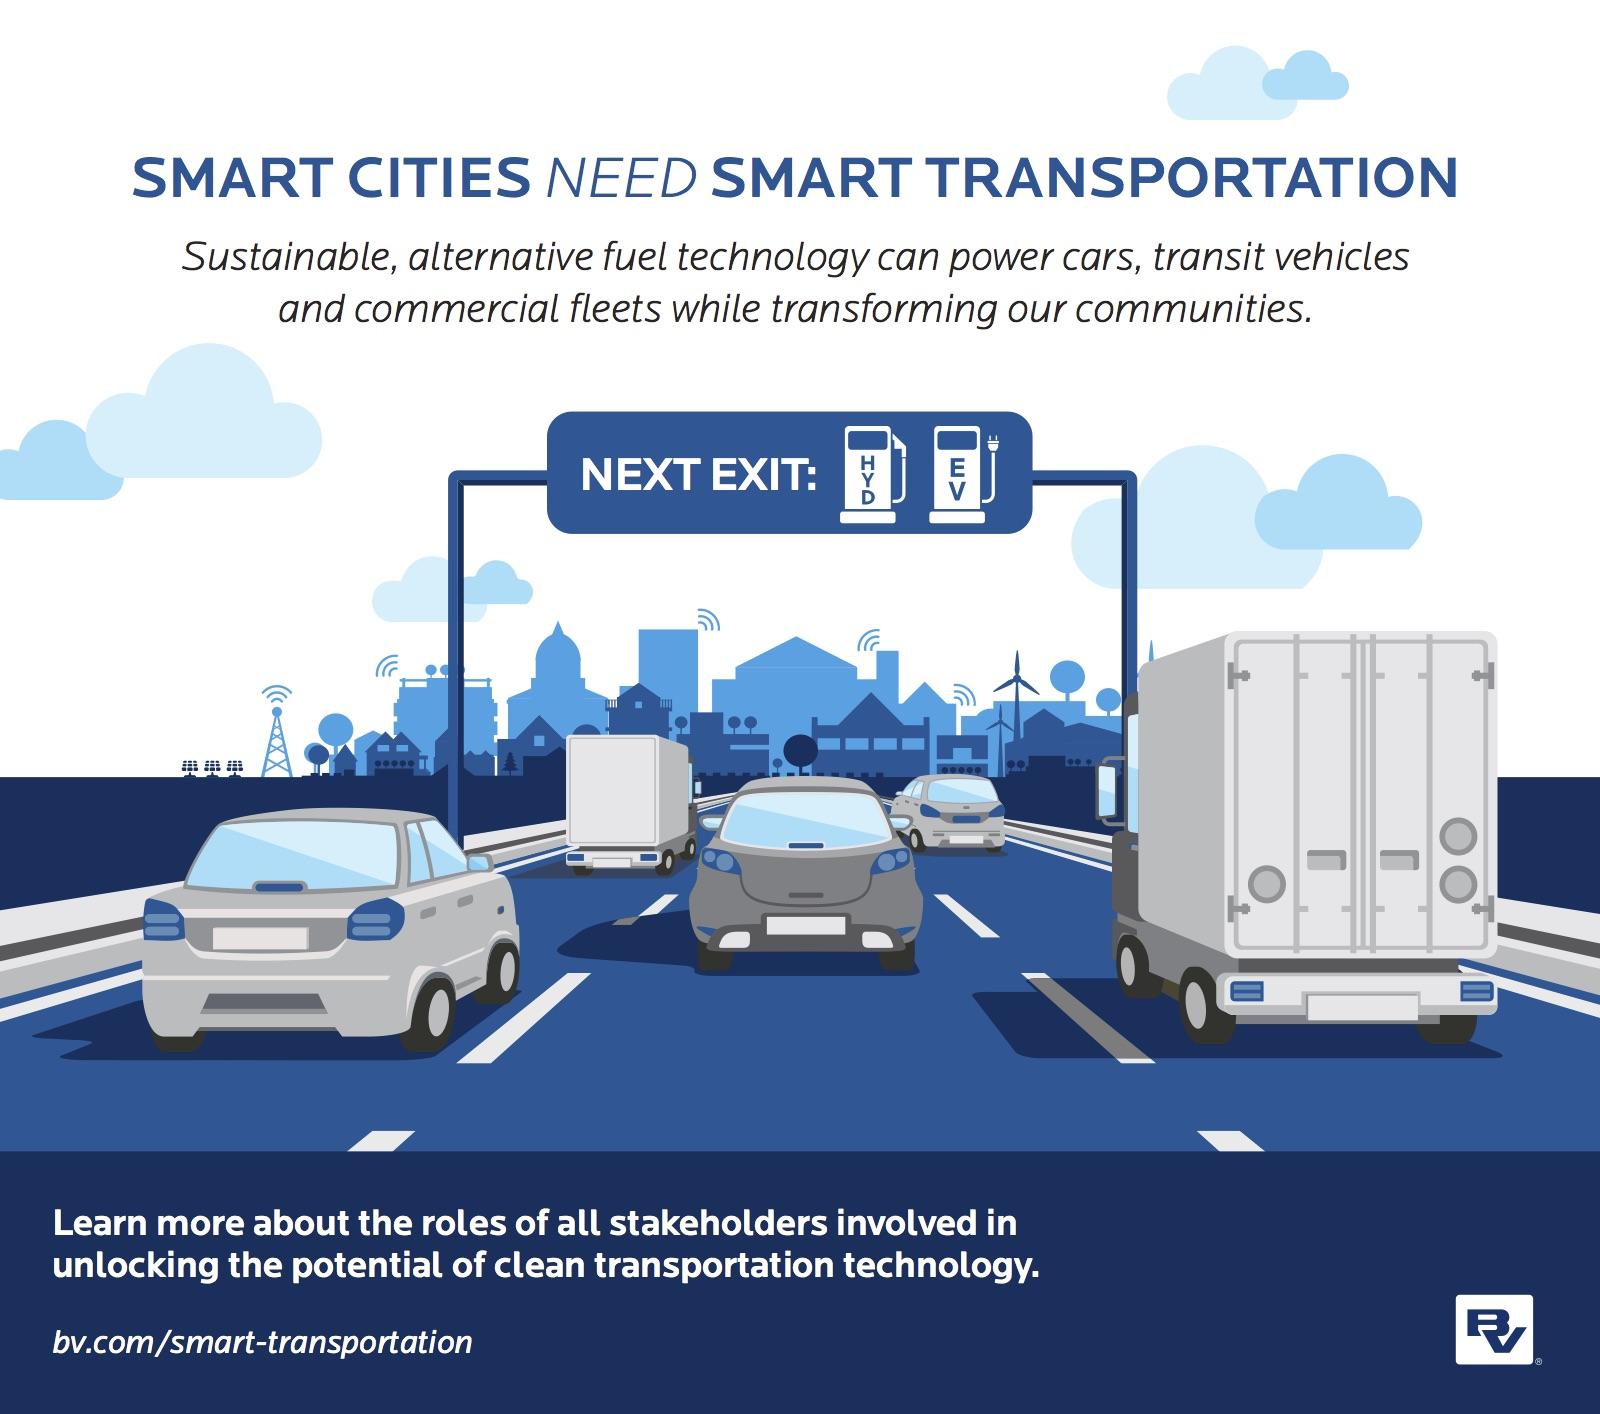 Kansas City Cars >> Alternative Fuel Sources to Transform Smart Cities, Fleets and Mass Transit   3BL Media